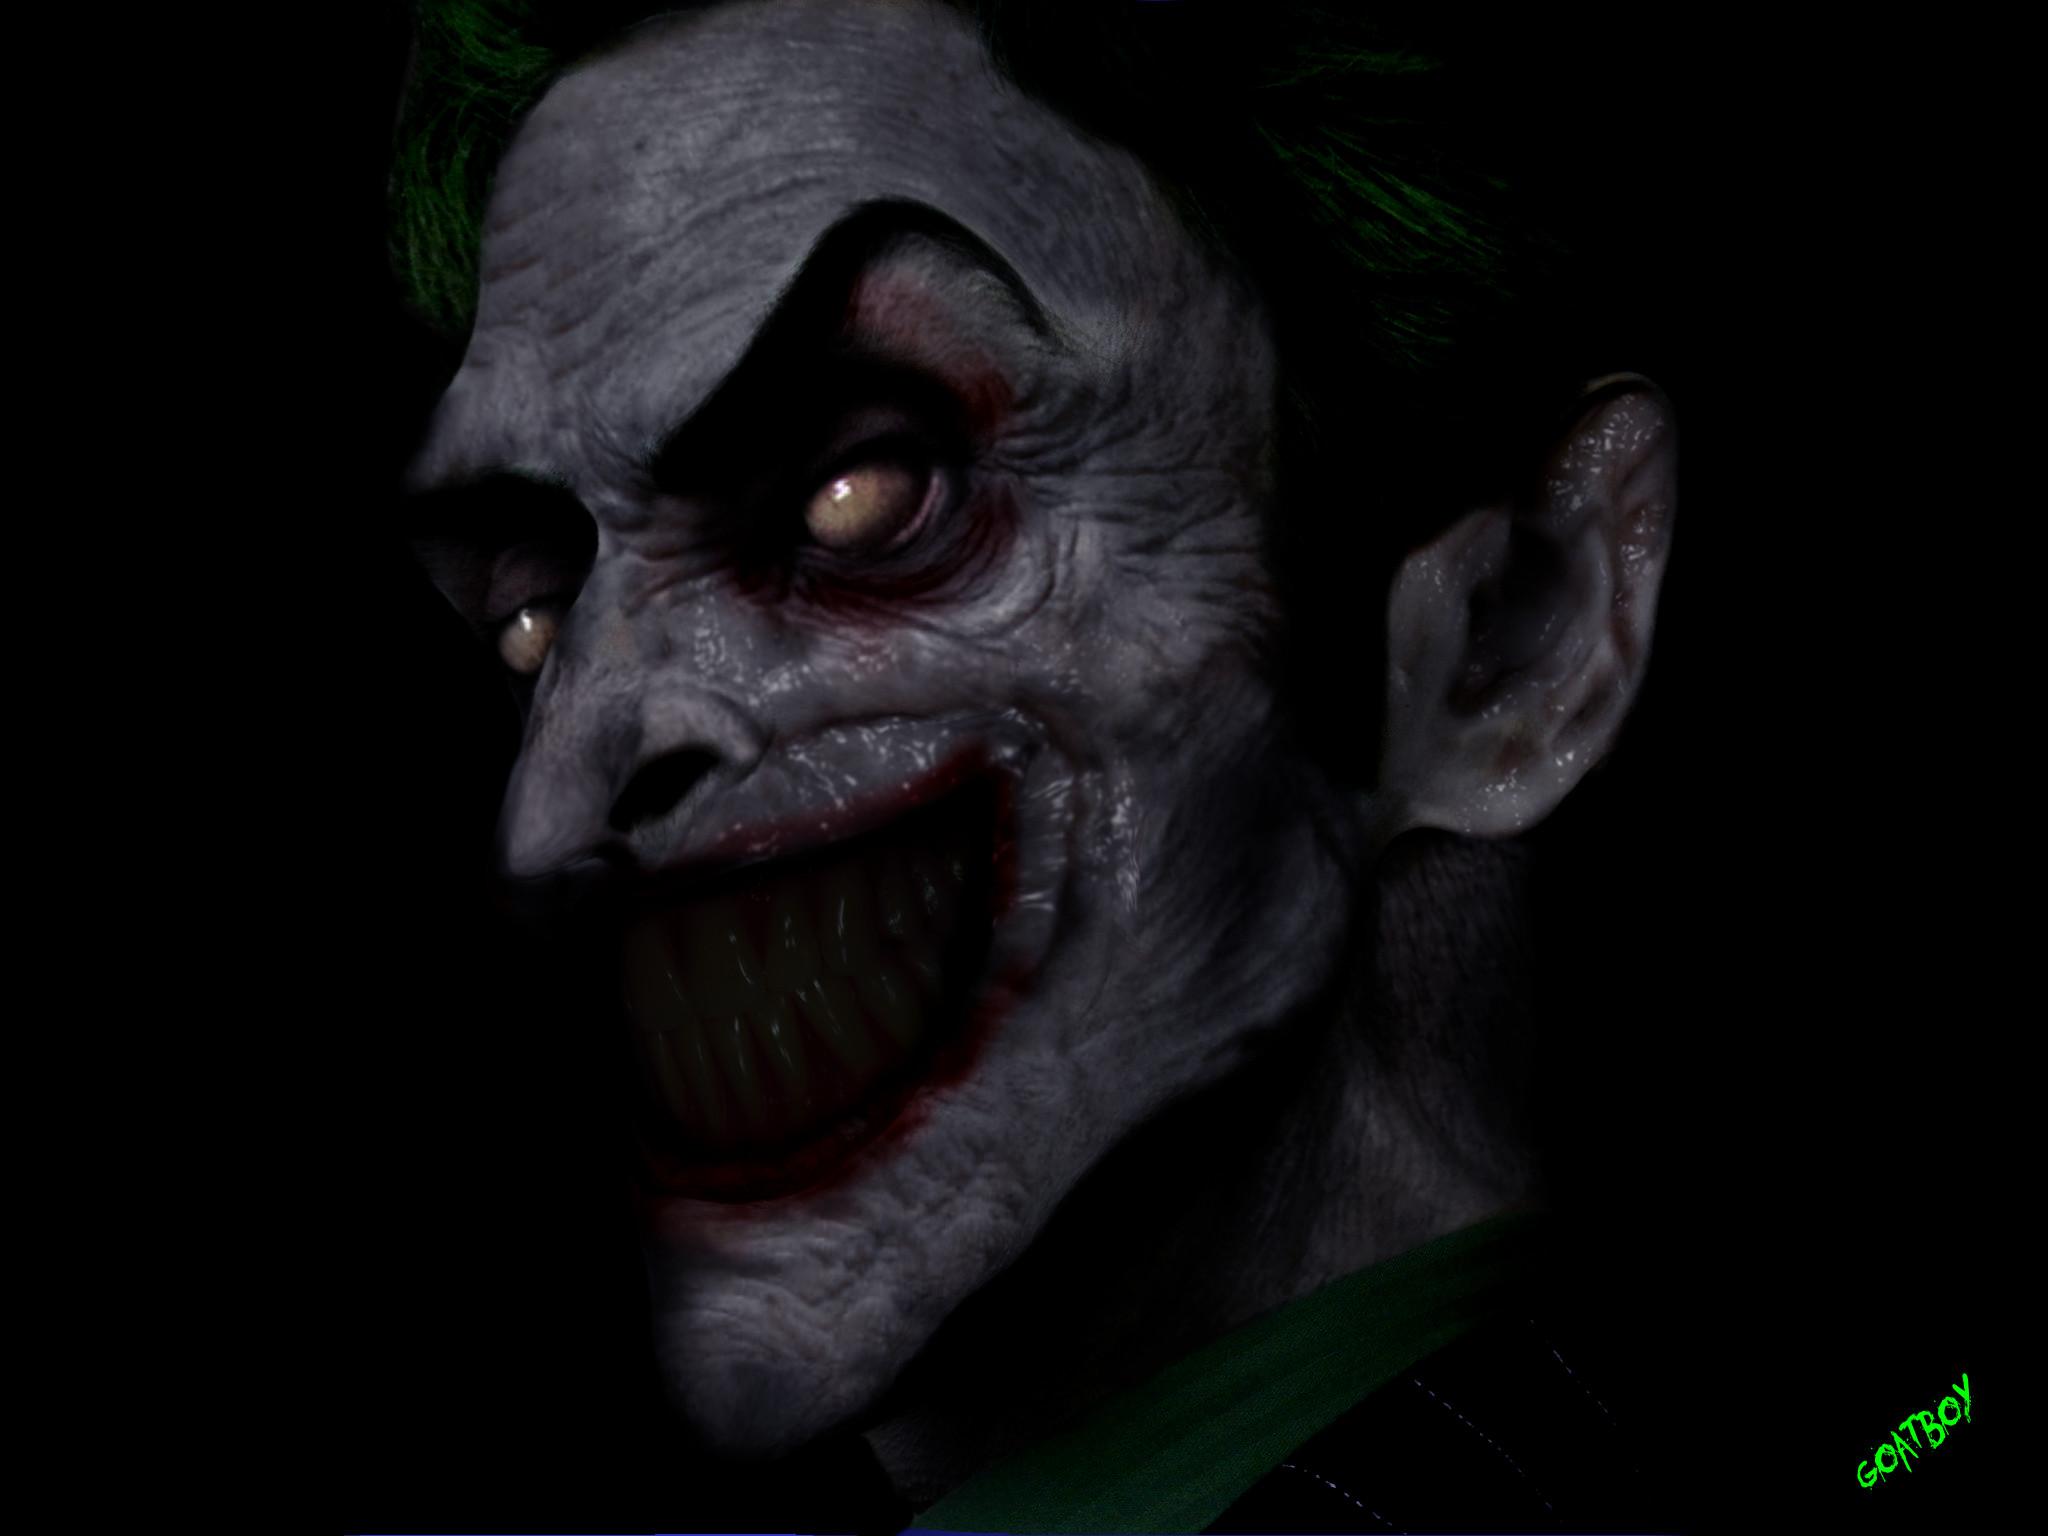 Evil Batman Wallpaper Evil Joker Wallpaper (...